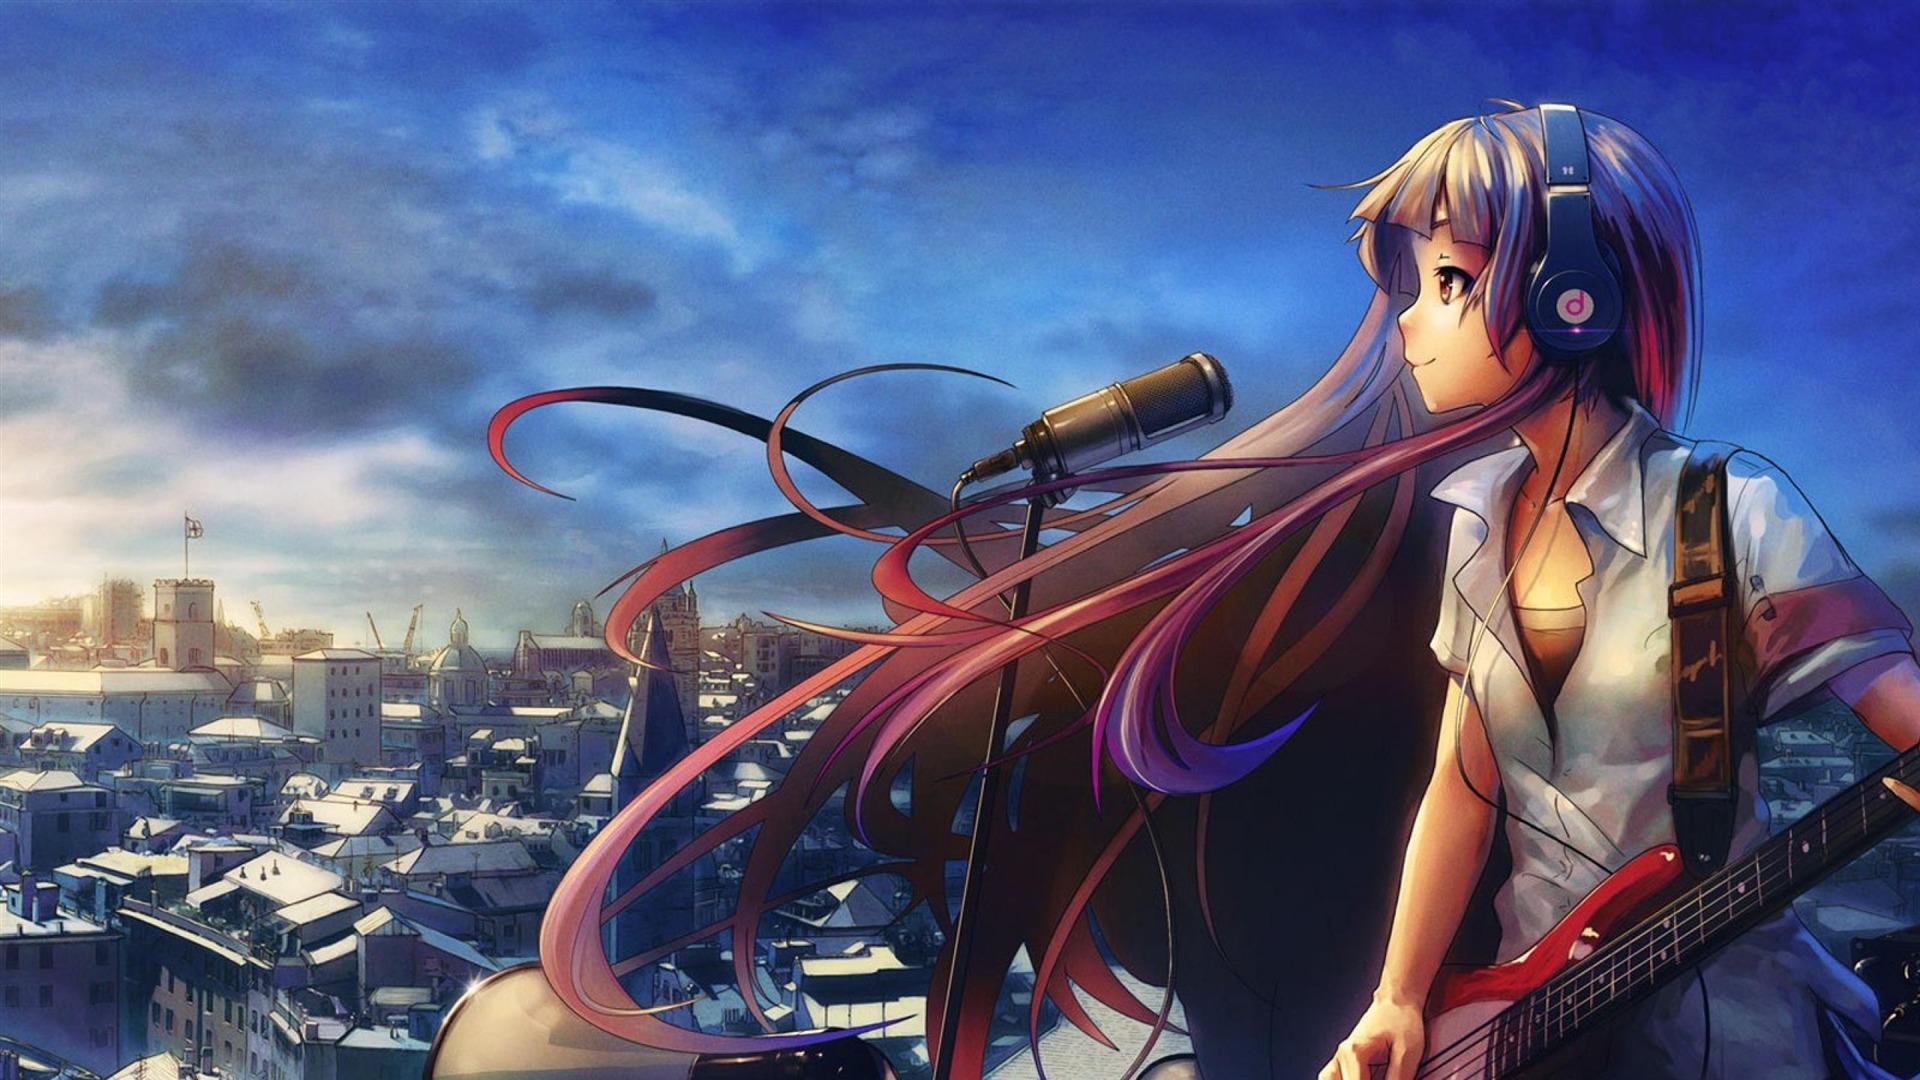 [Imagen: girl-guitar-music-anime-design-hd-wallpa...0x1080.jpg]